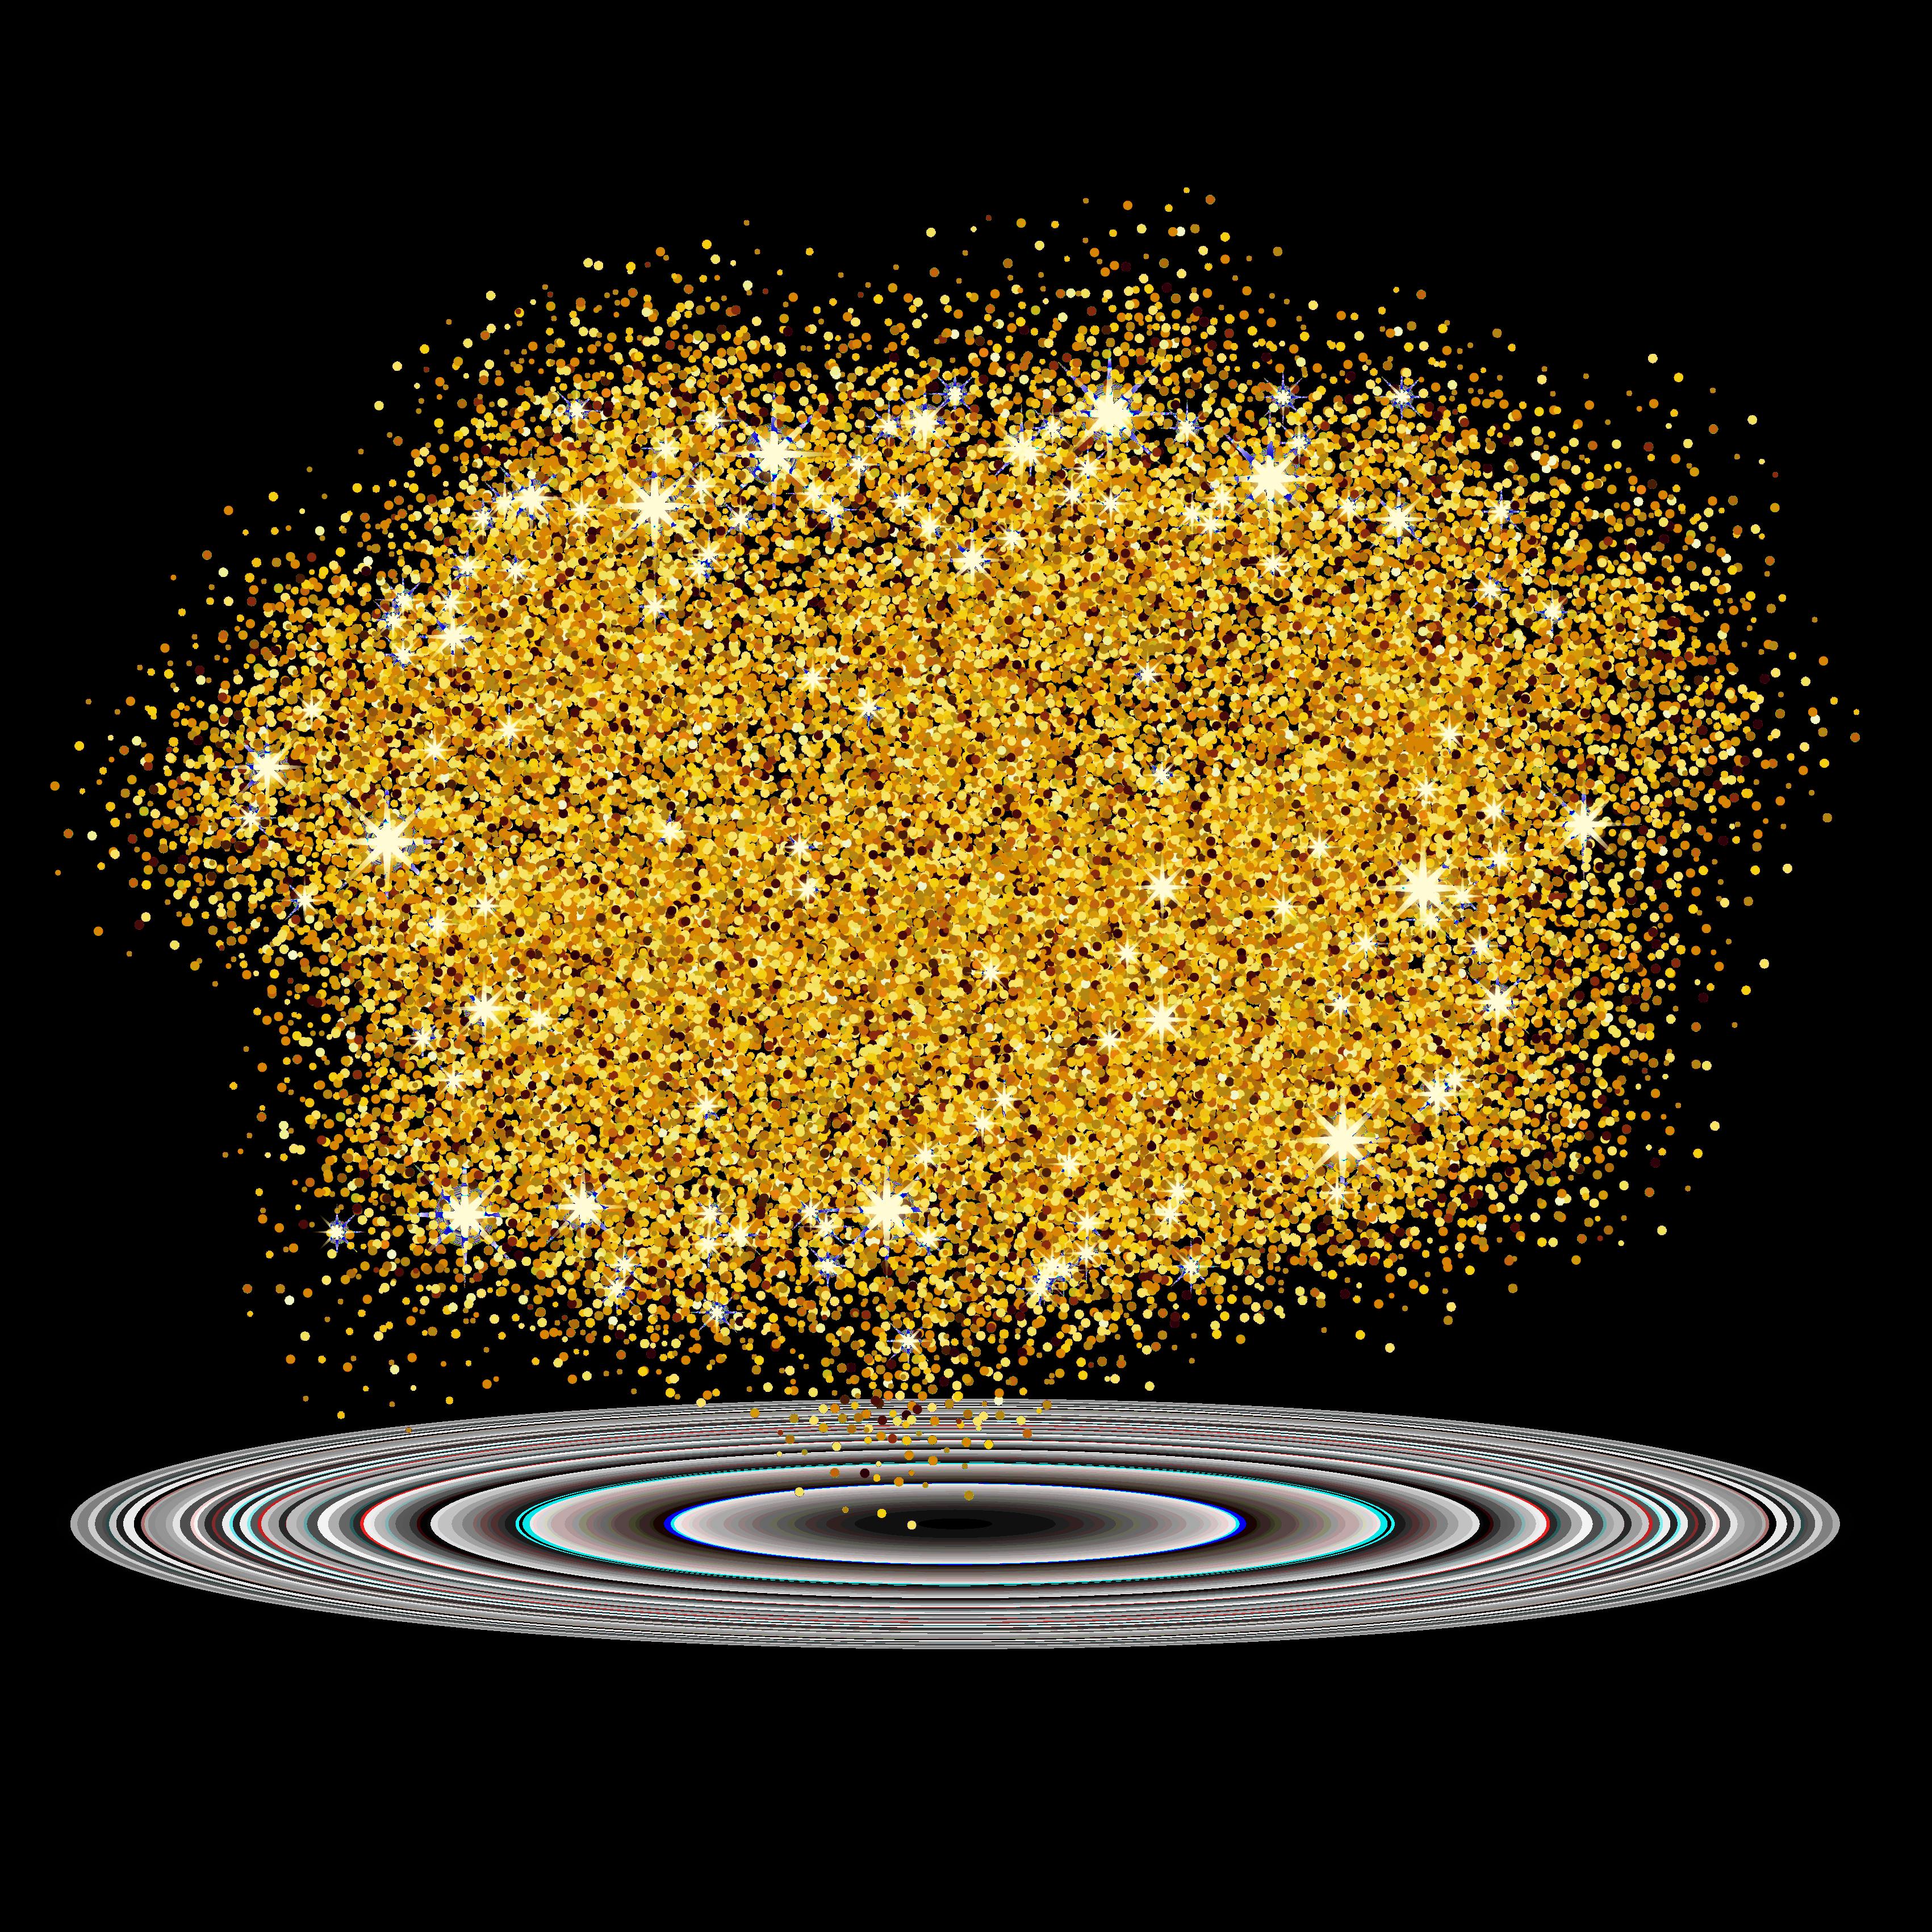 Desktop wallpaper clip art. Pineapple clipart gold glitter